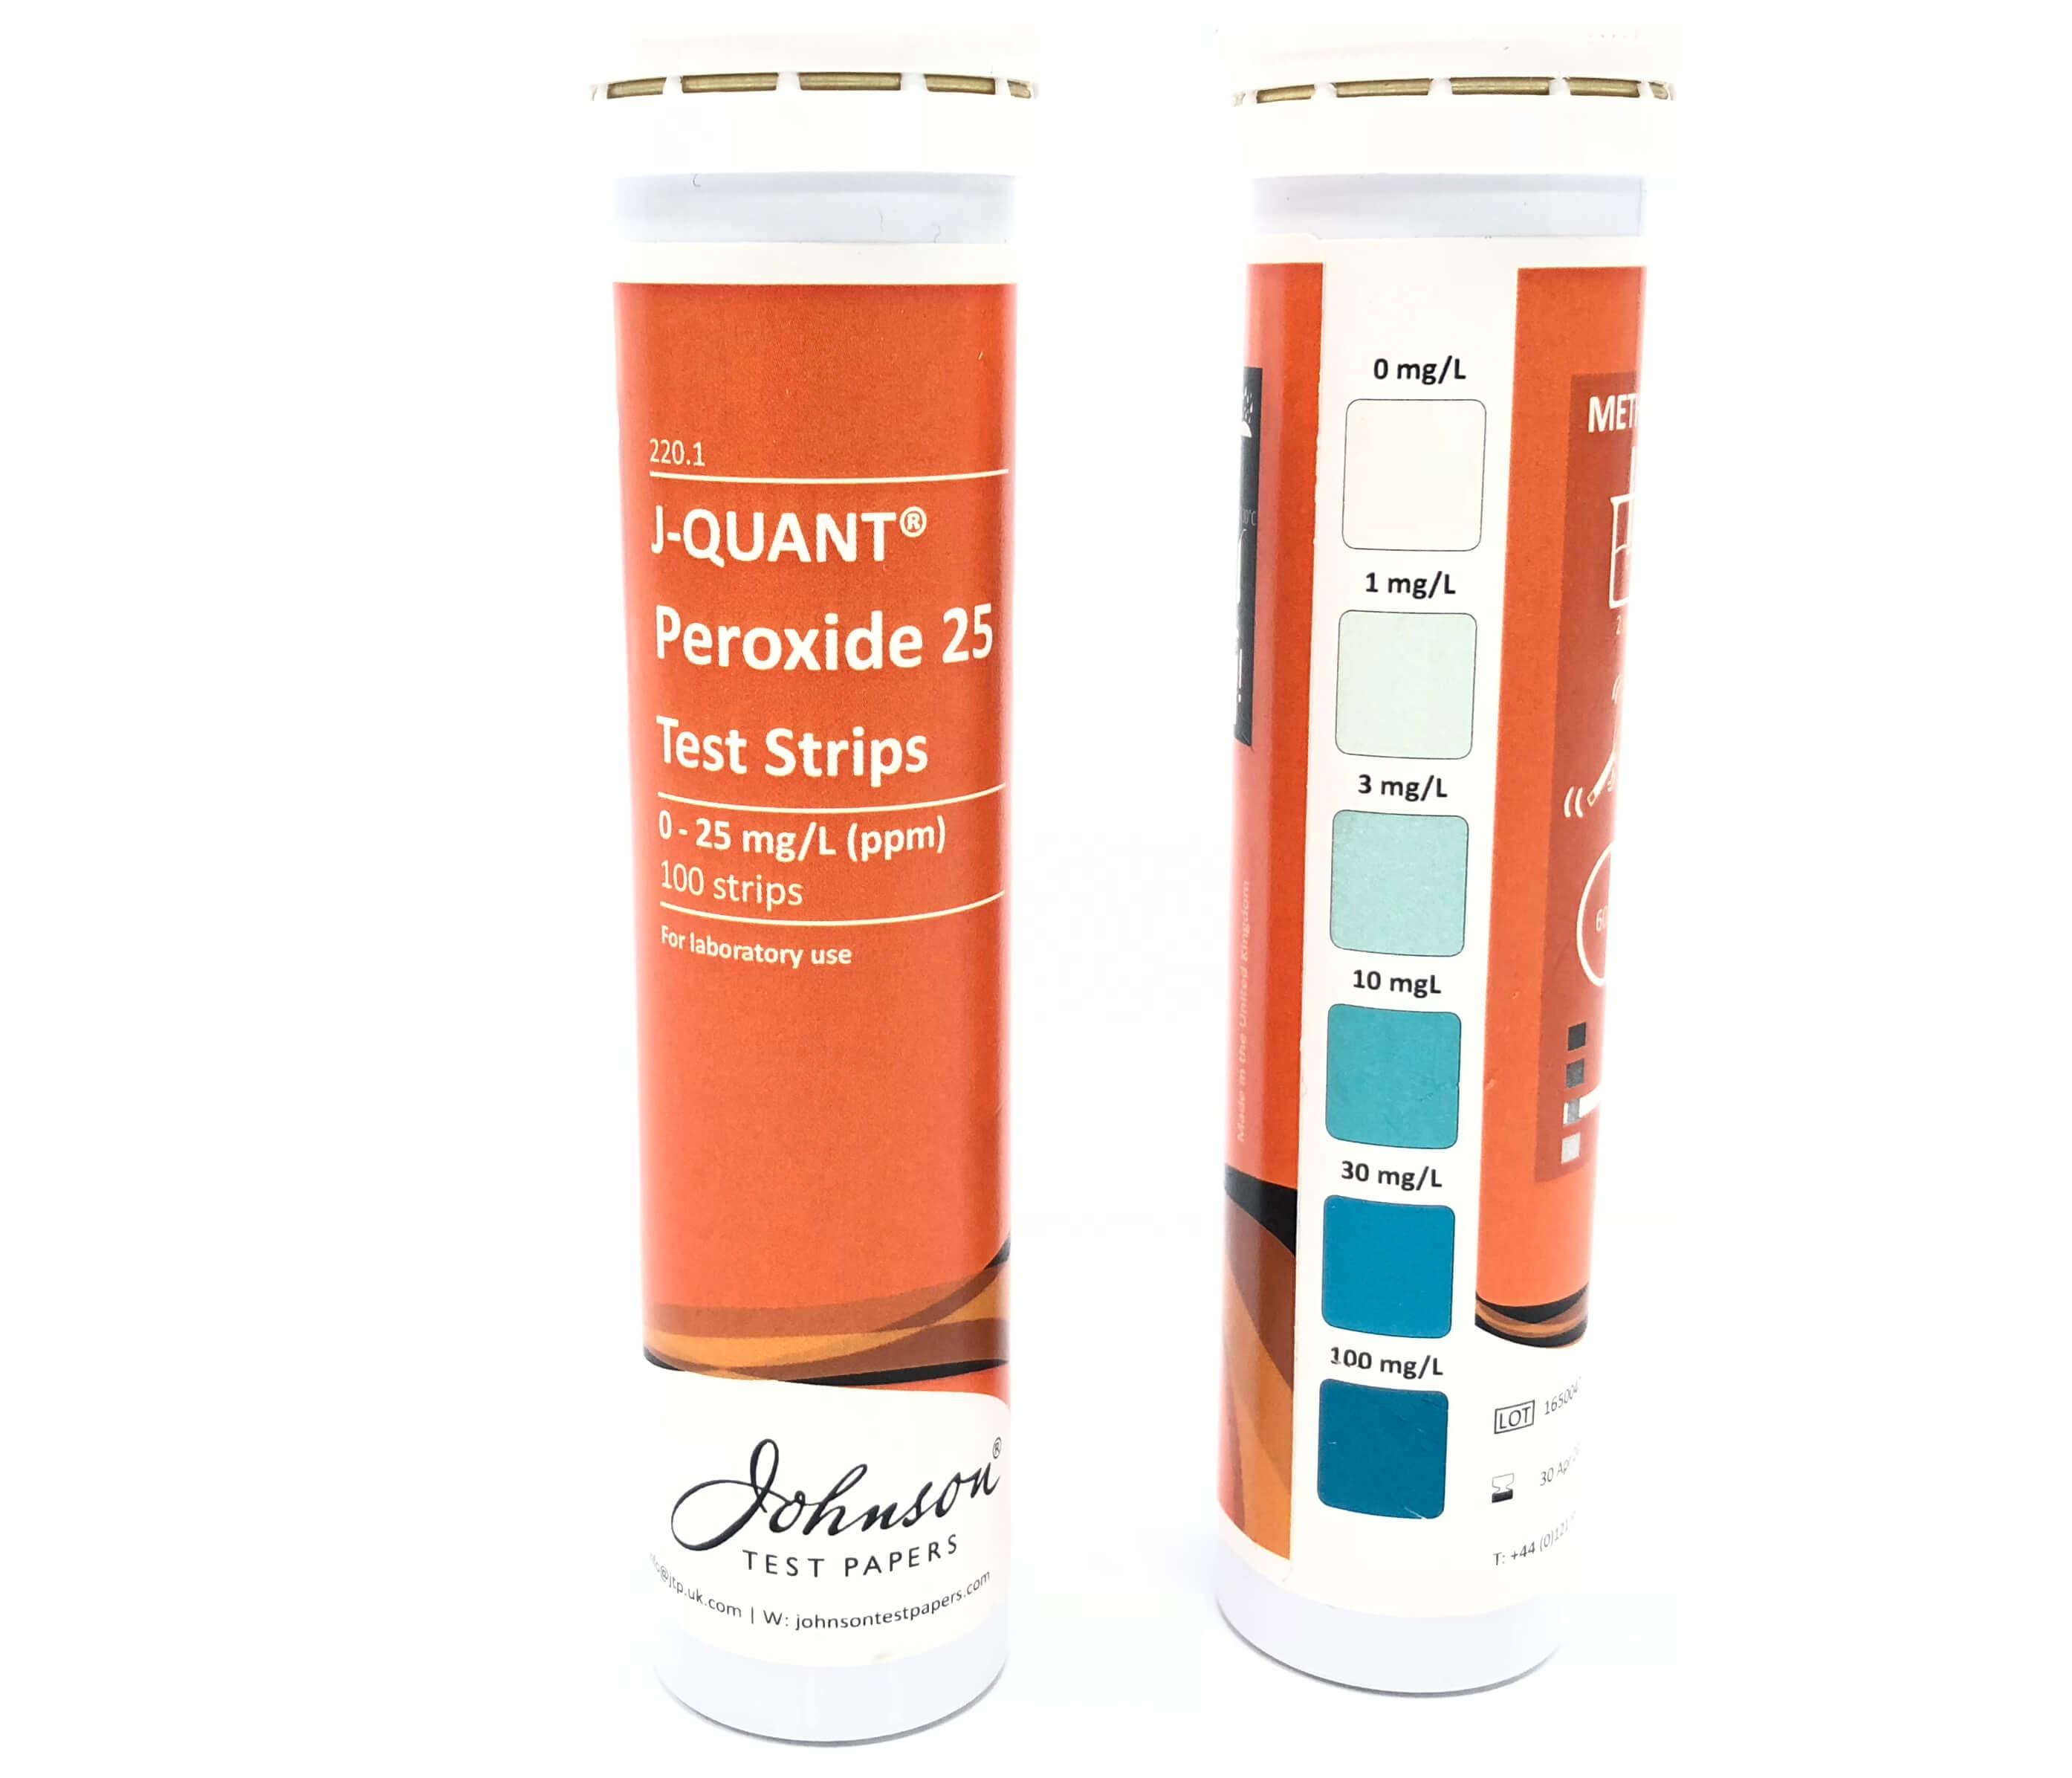 J-QUANT<sup>®</sup> Peroxide